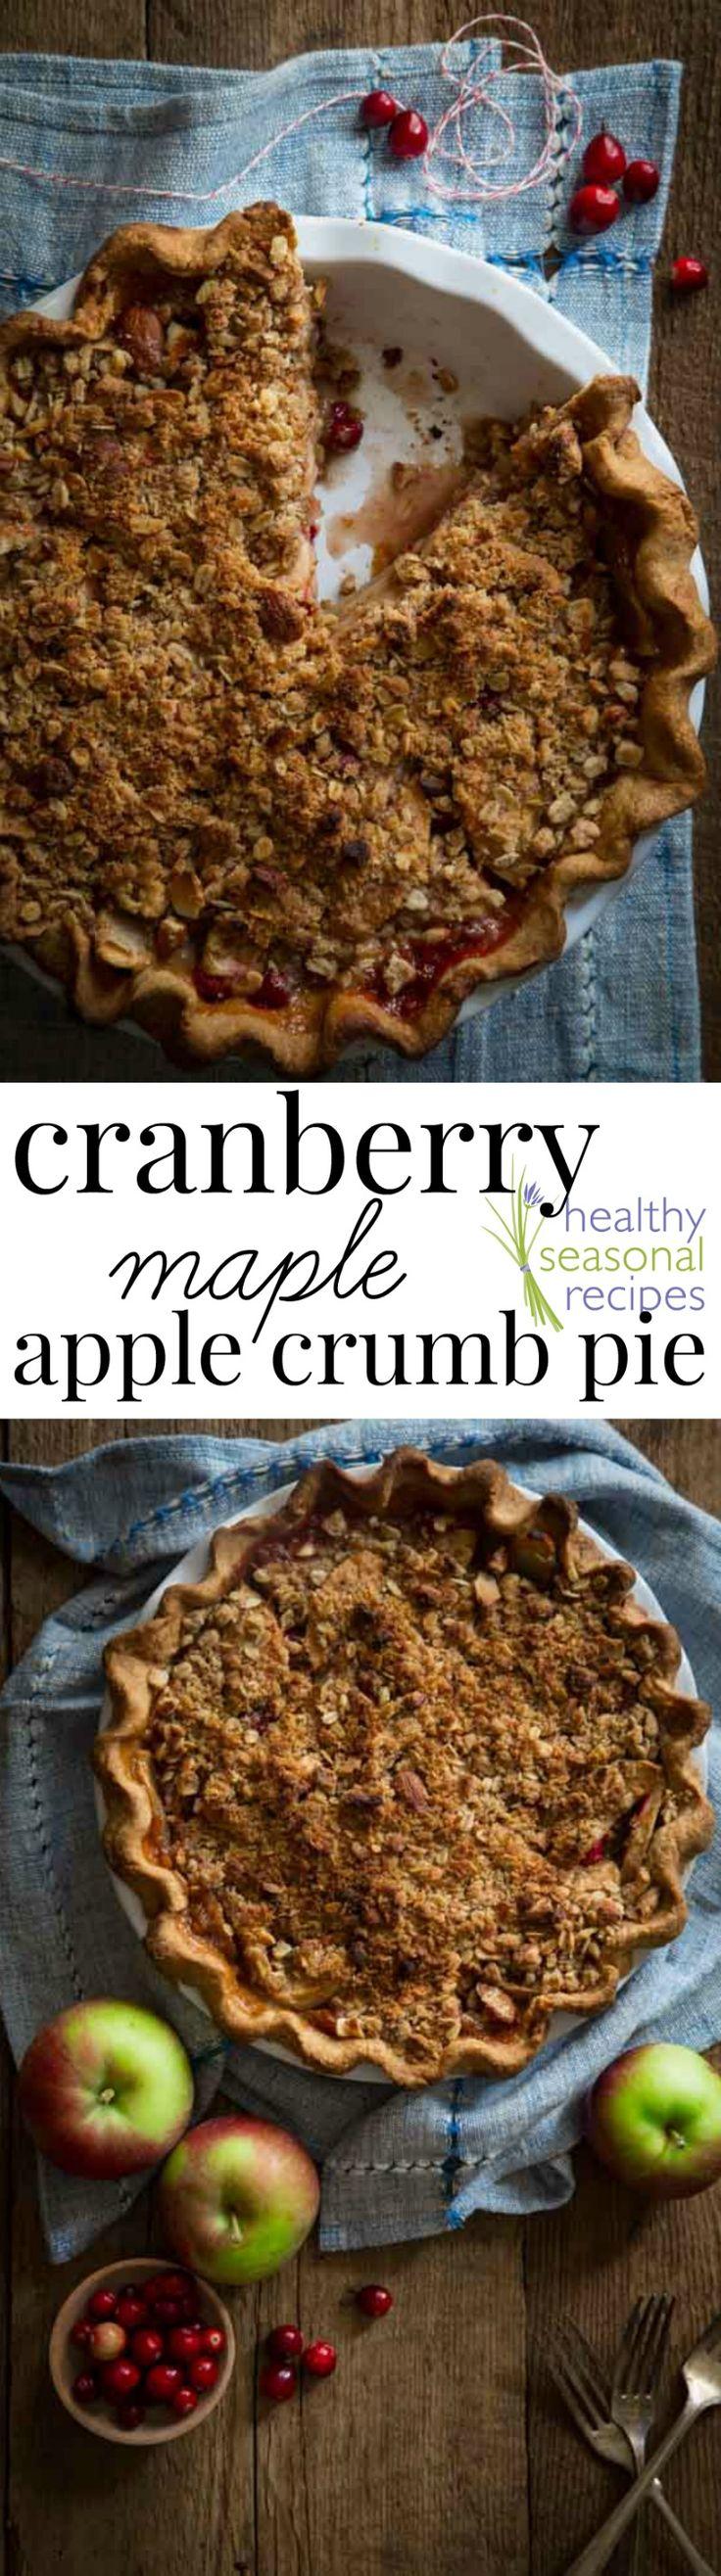 cranberry maple apple crumb pie - Healthy Seasonal Recipes